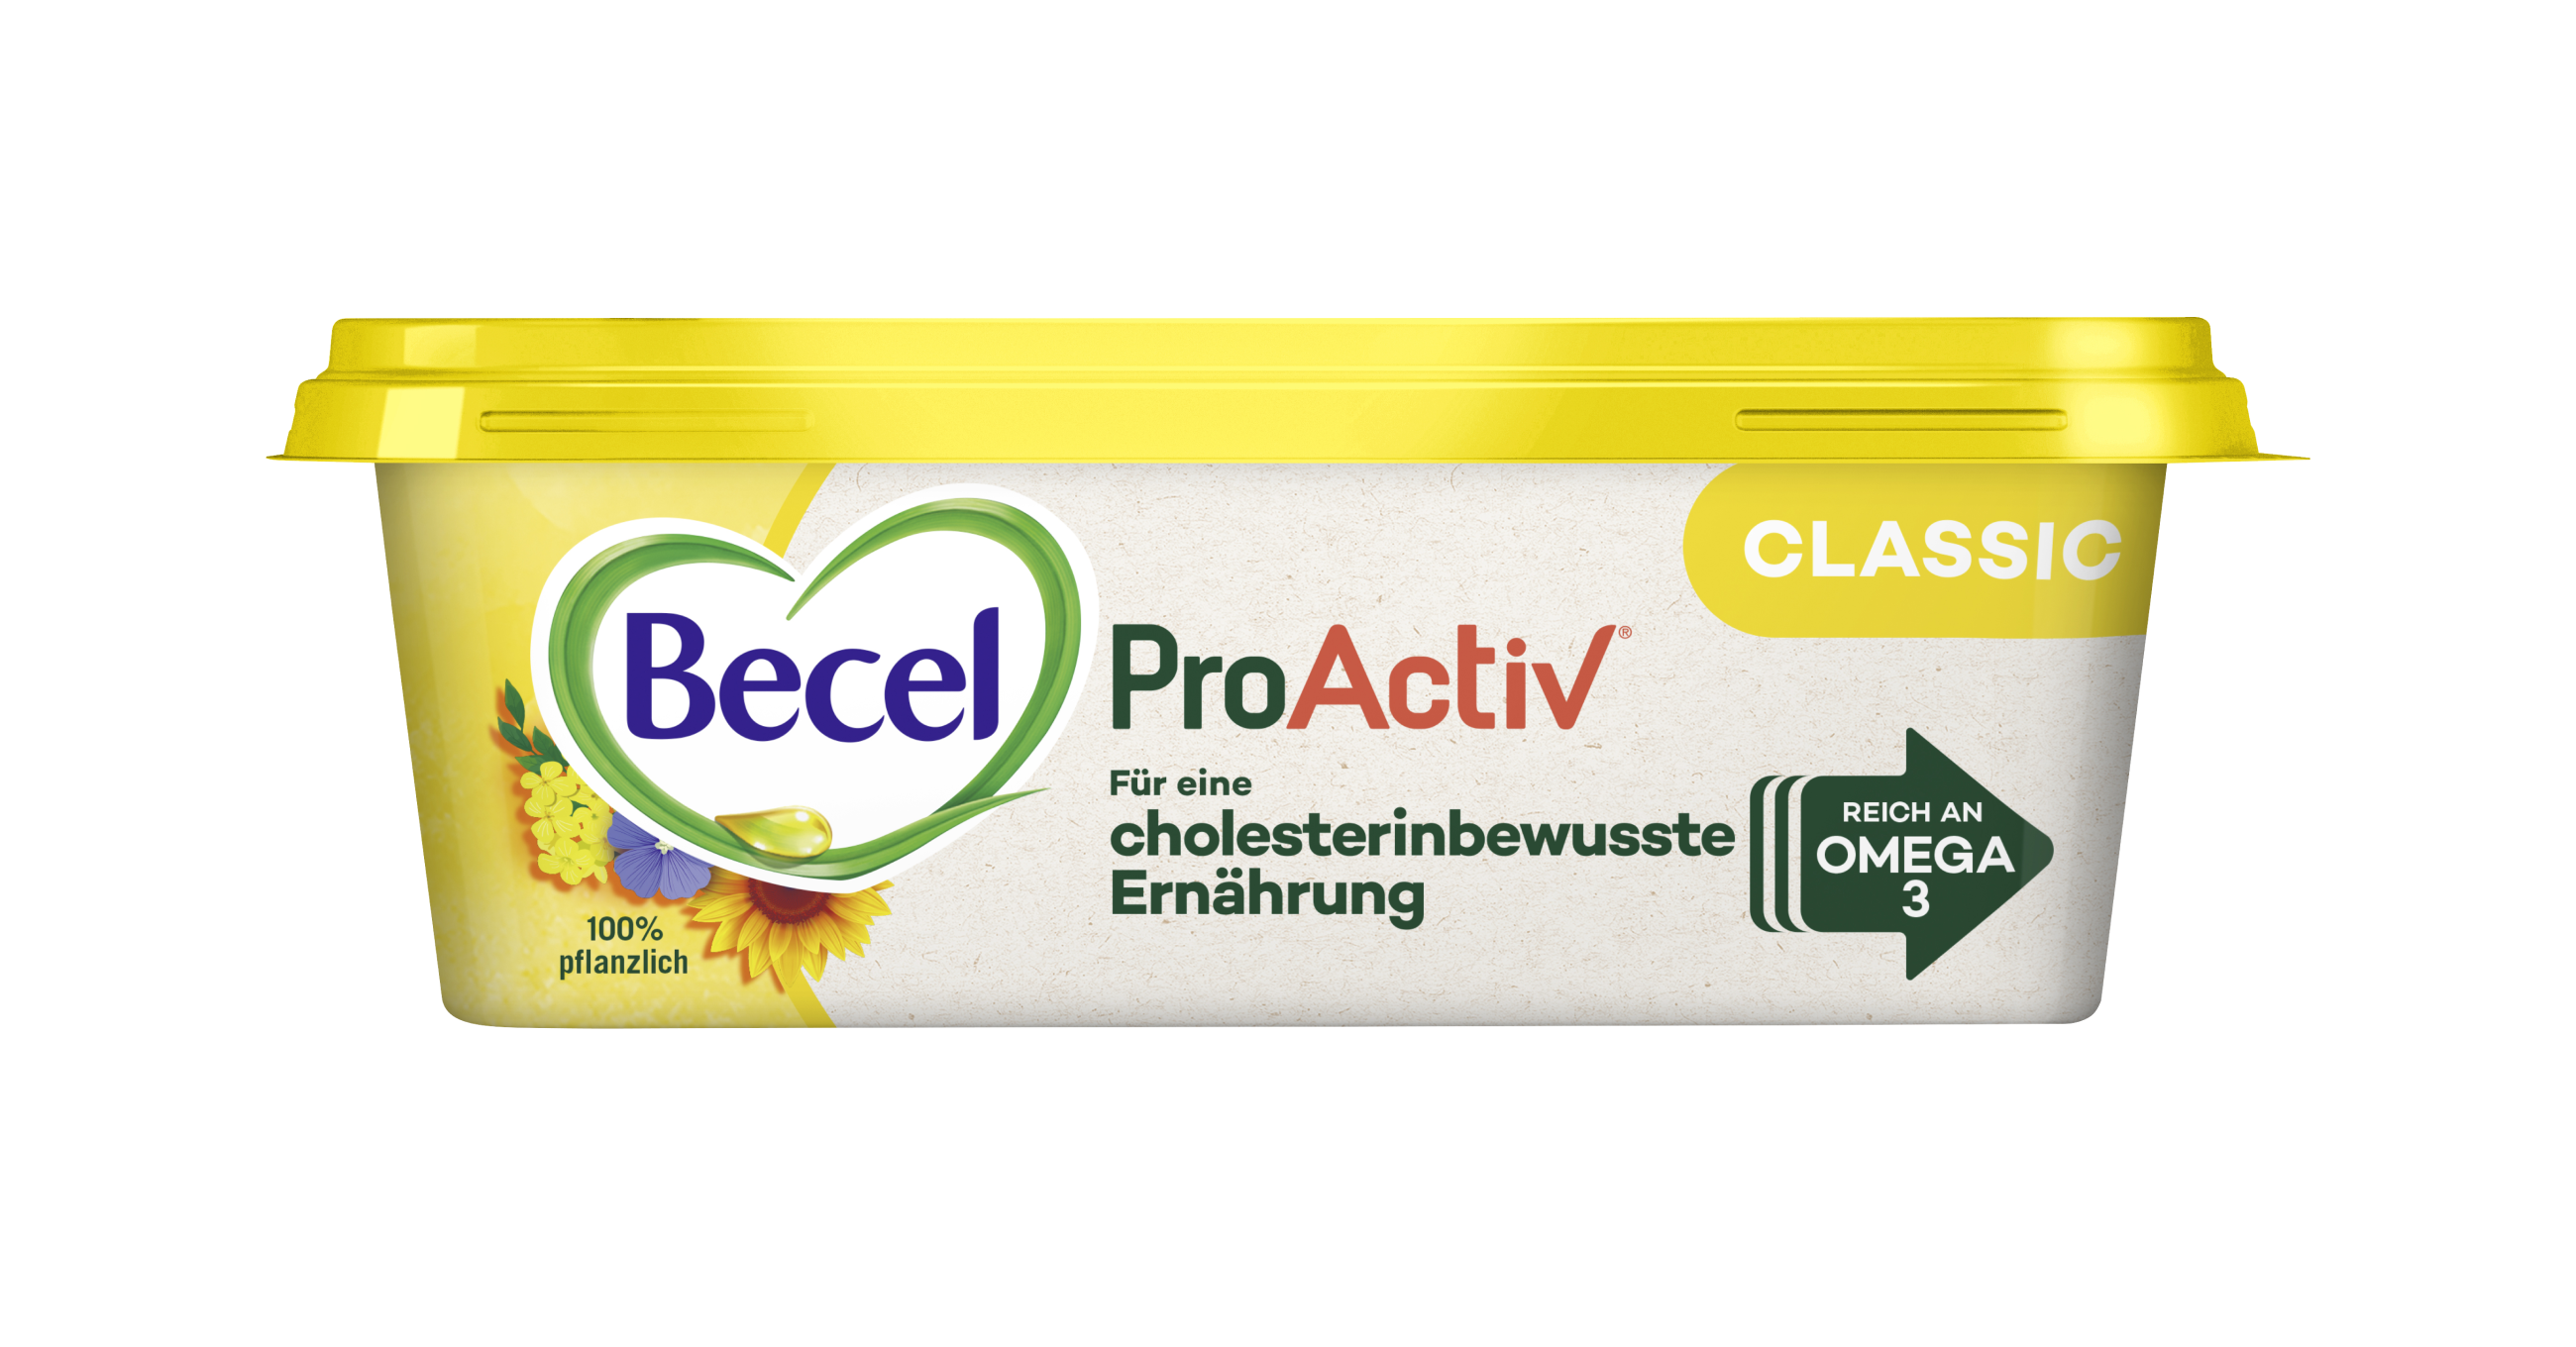 Becel Pro Activ